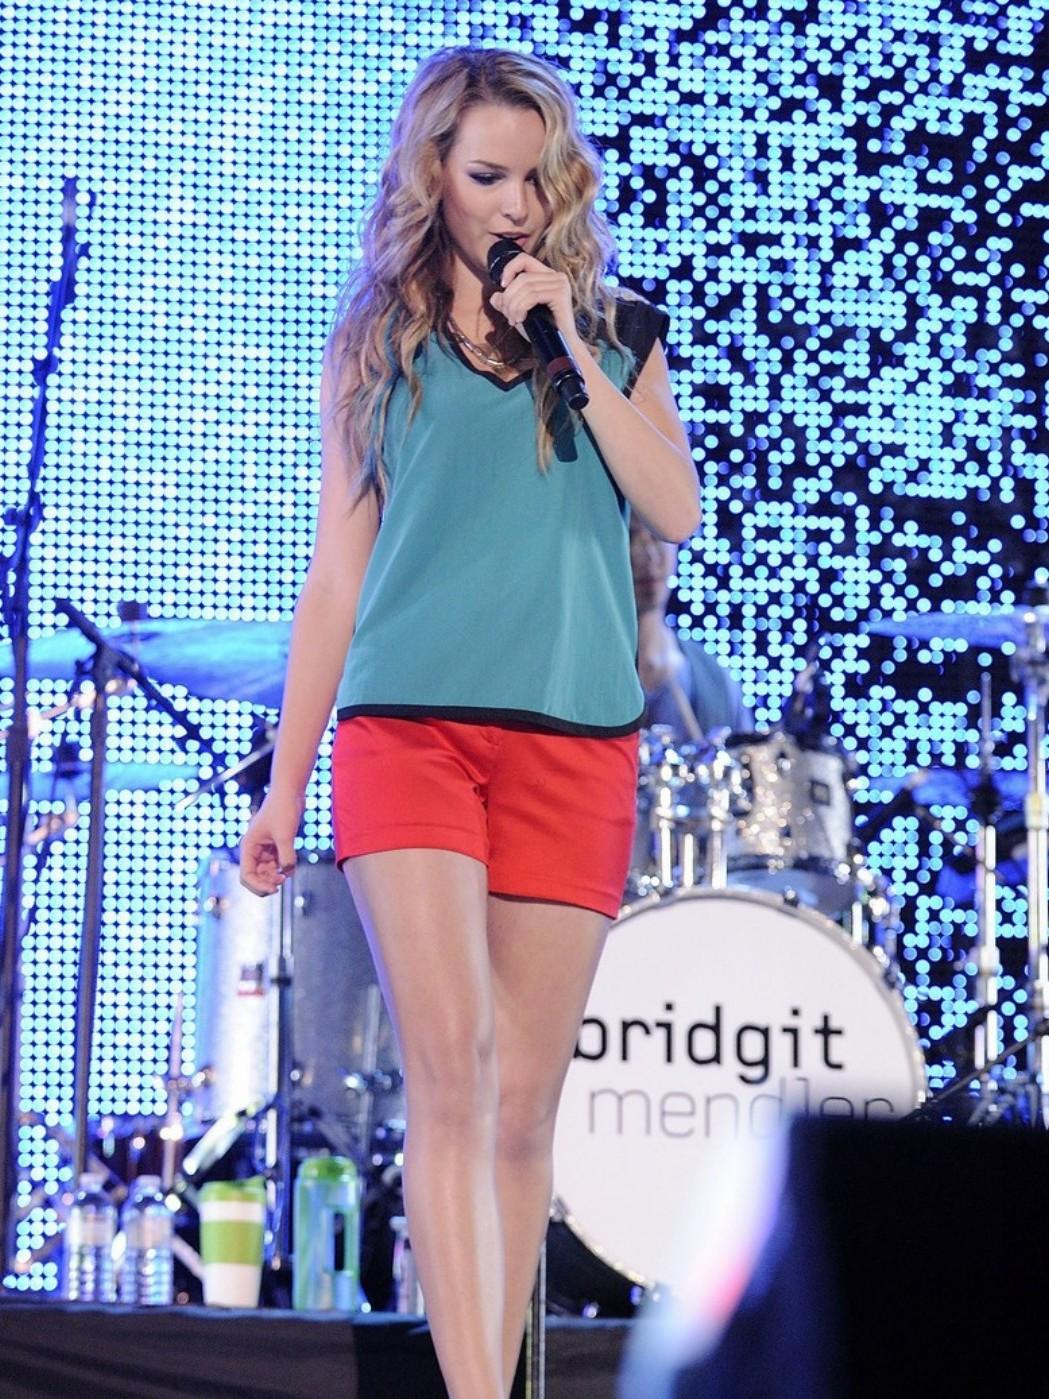 Bridgit_Mendler_Performance_Toronto_August_26_2012_ (14).jpg